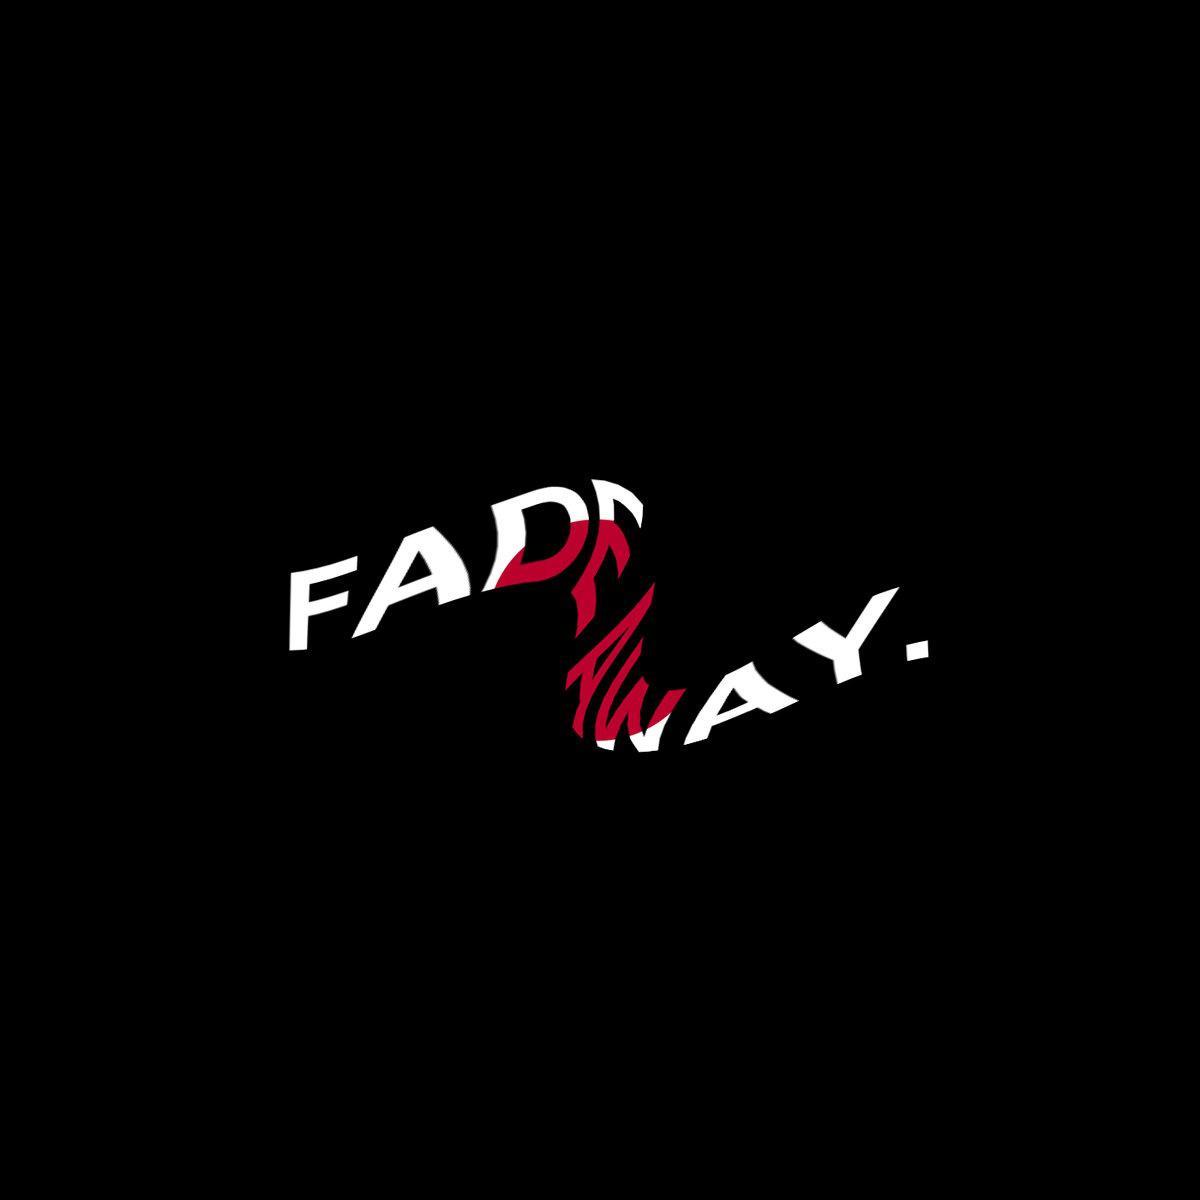 fadeaway钢琴谱简谱